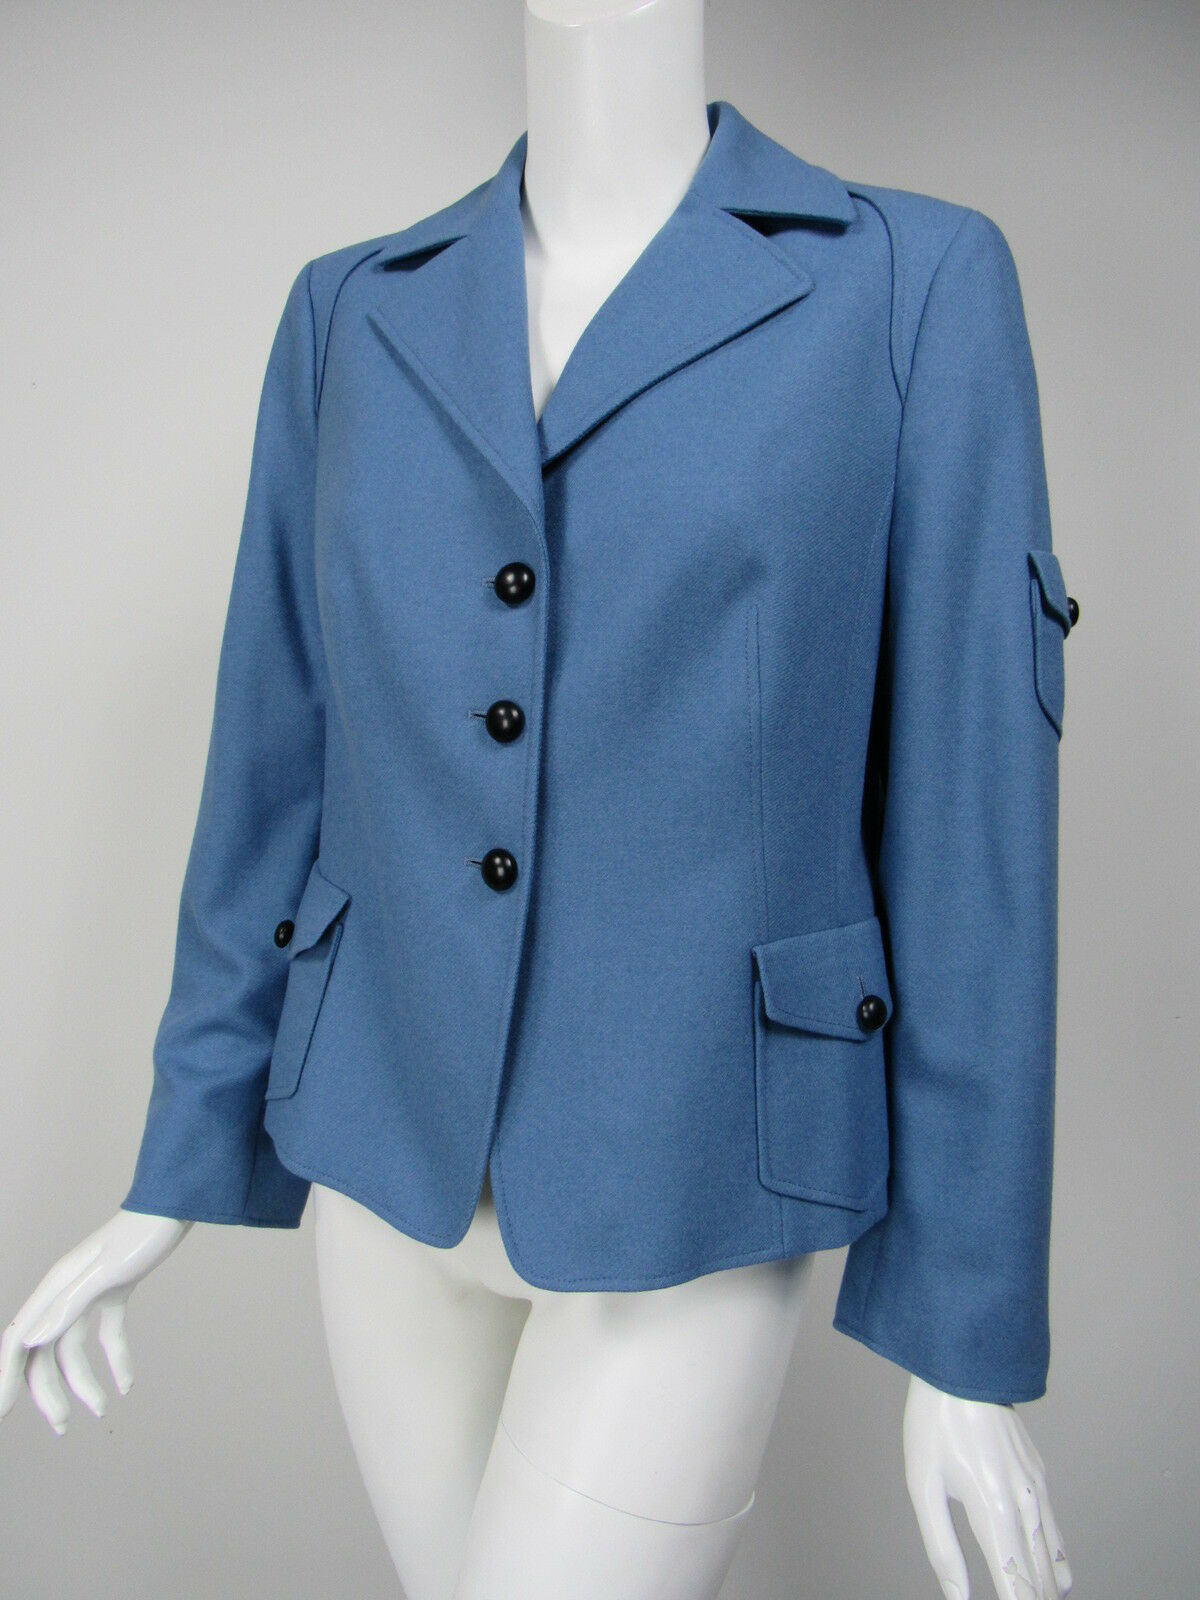 AKRIS PUNTO Cornflower bluee Wool Angora Button Blazer D 42 US 12